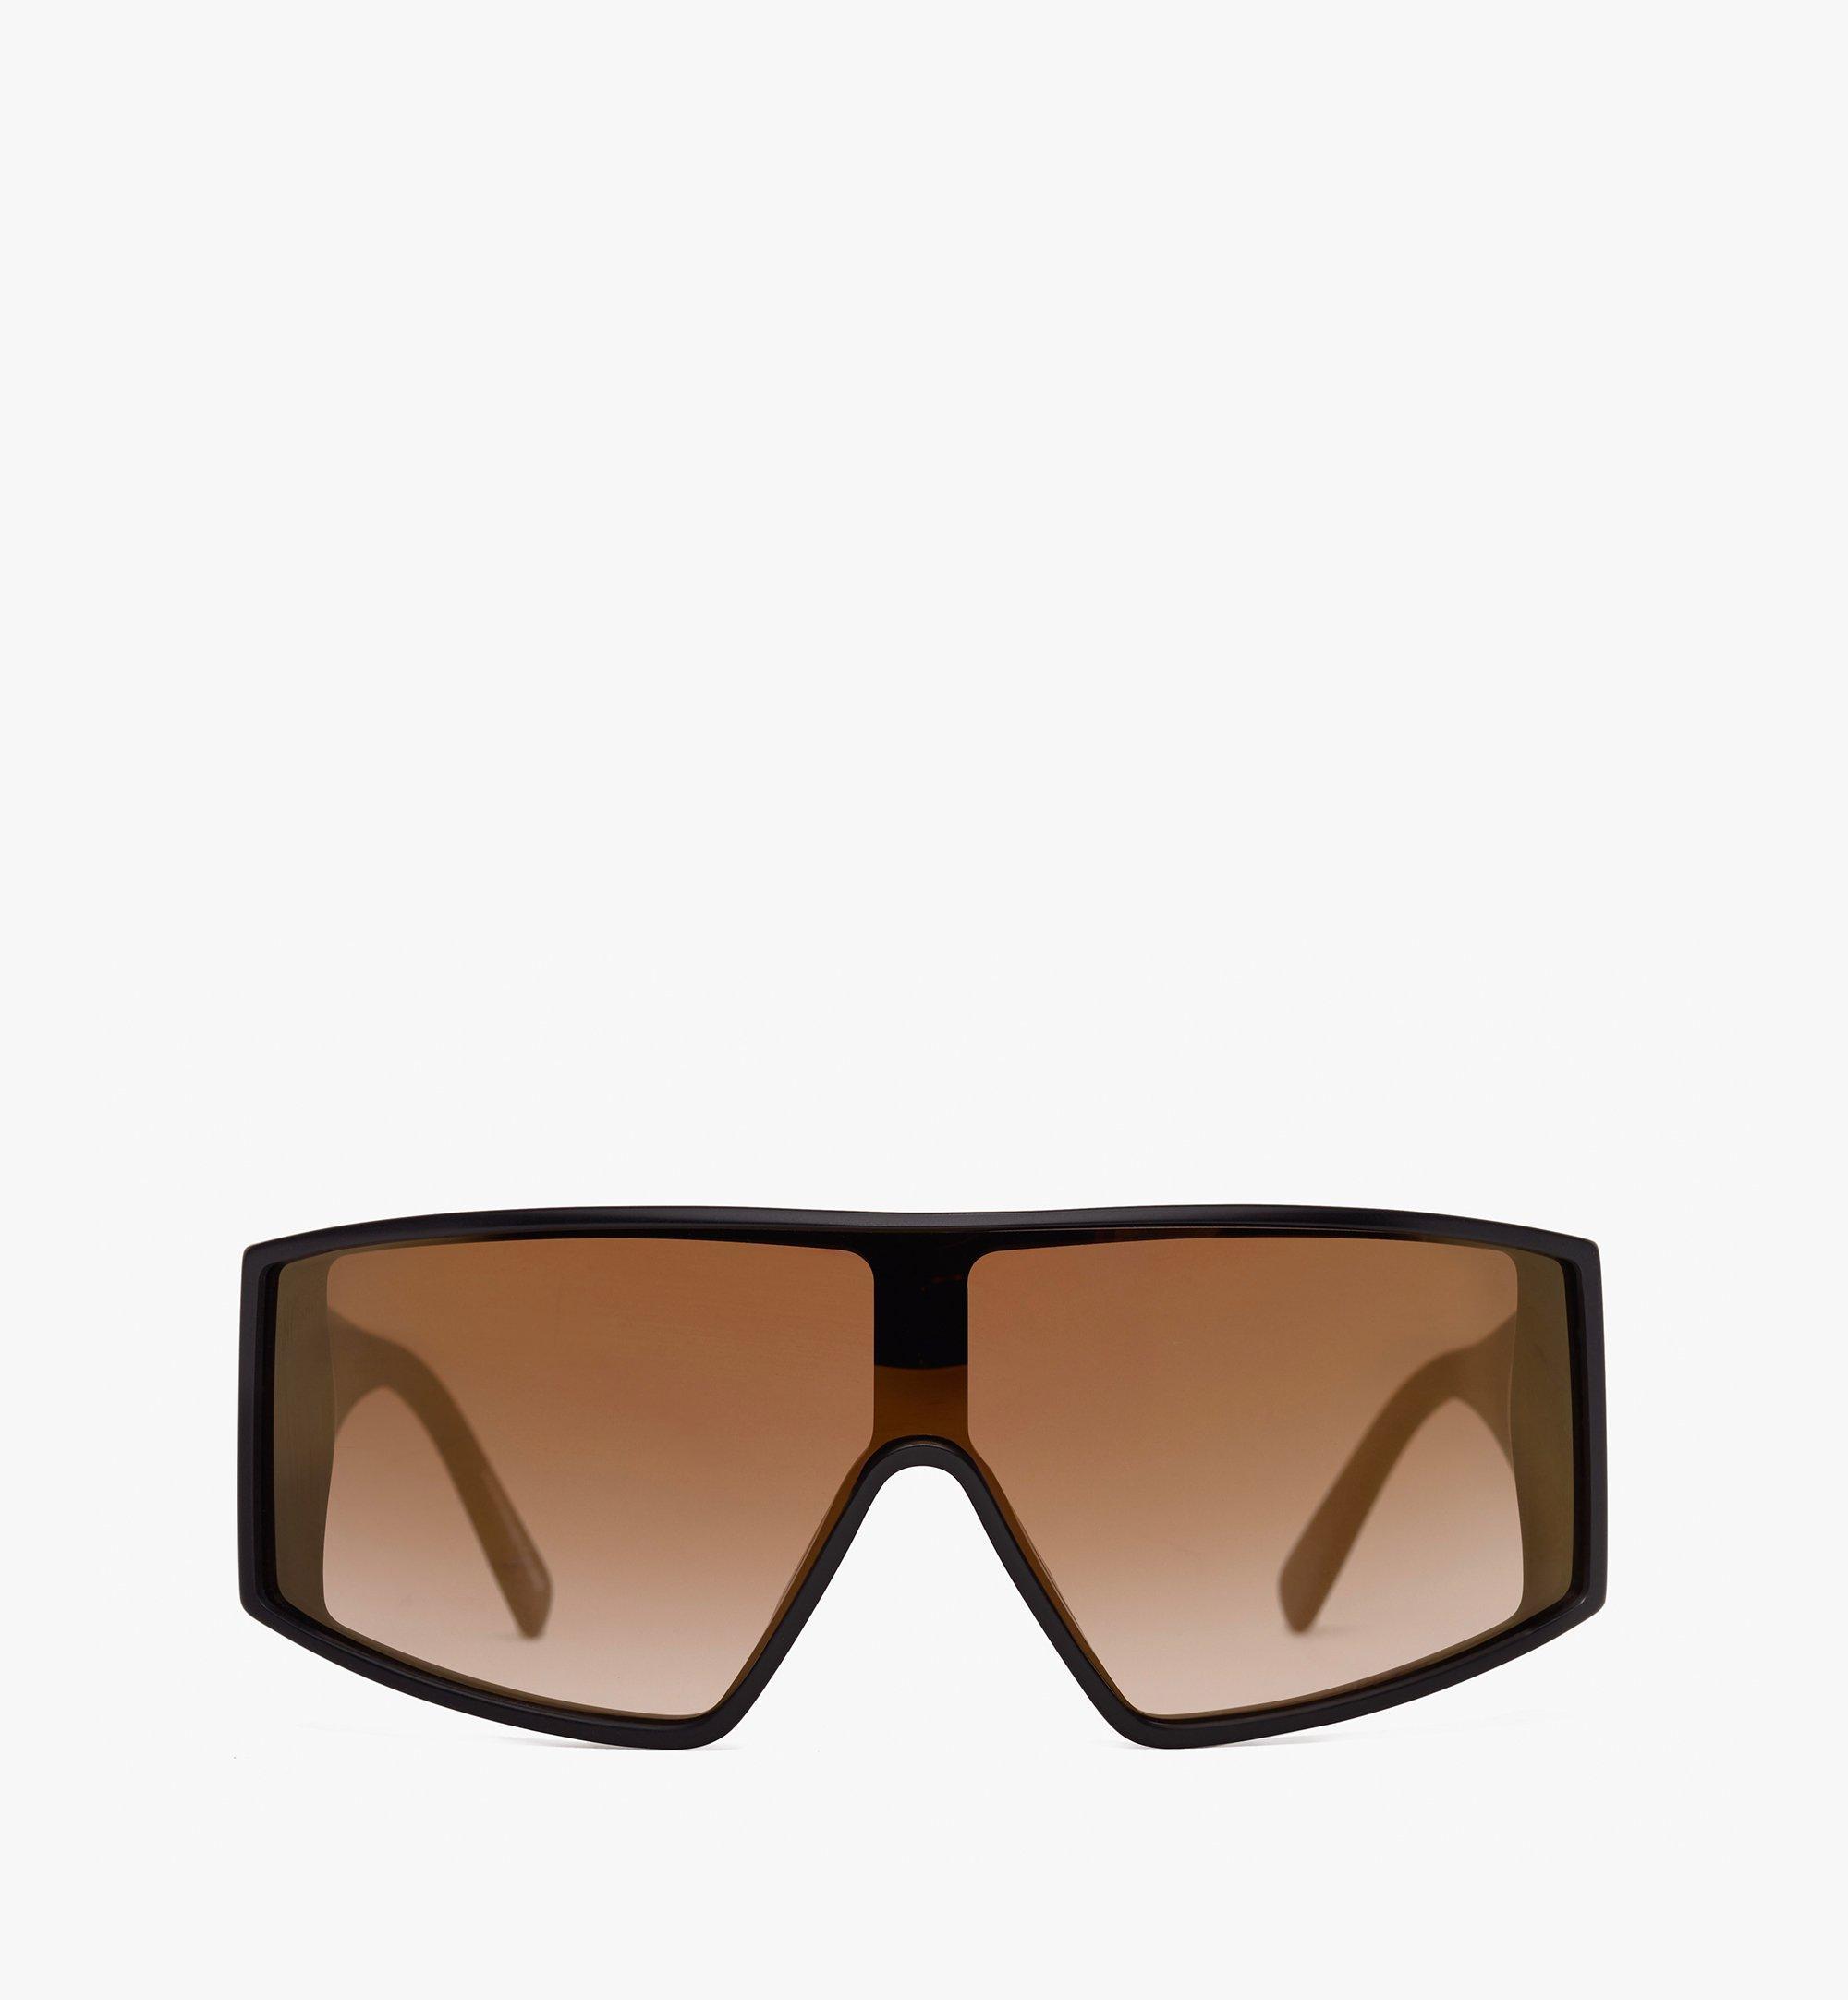 MCM Shield Sunglasses Gold MEG9A2I11DG001 Alternate View 1